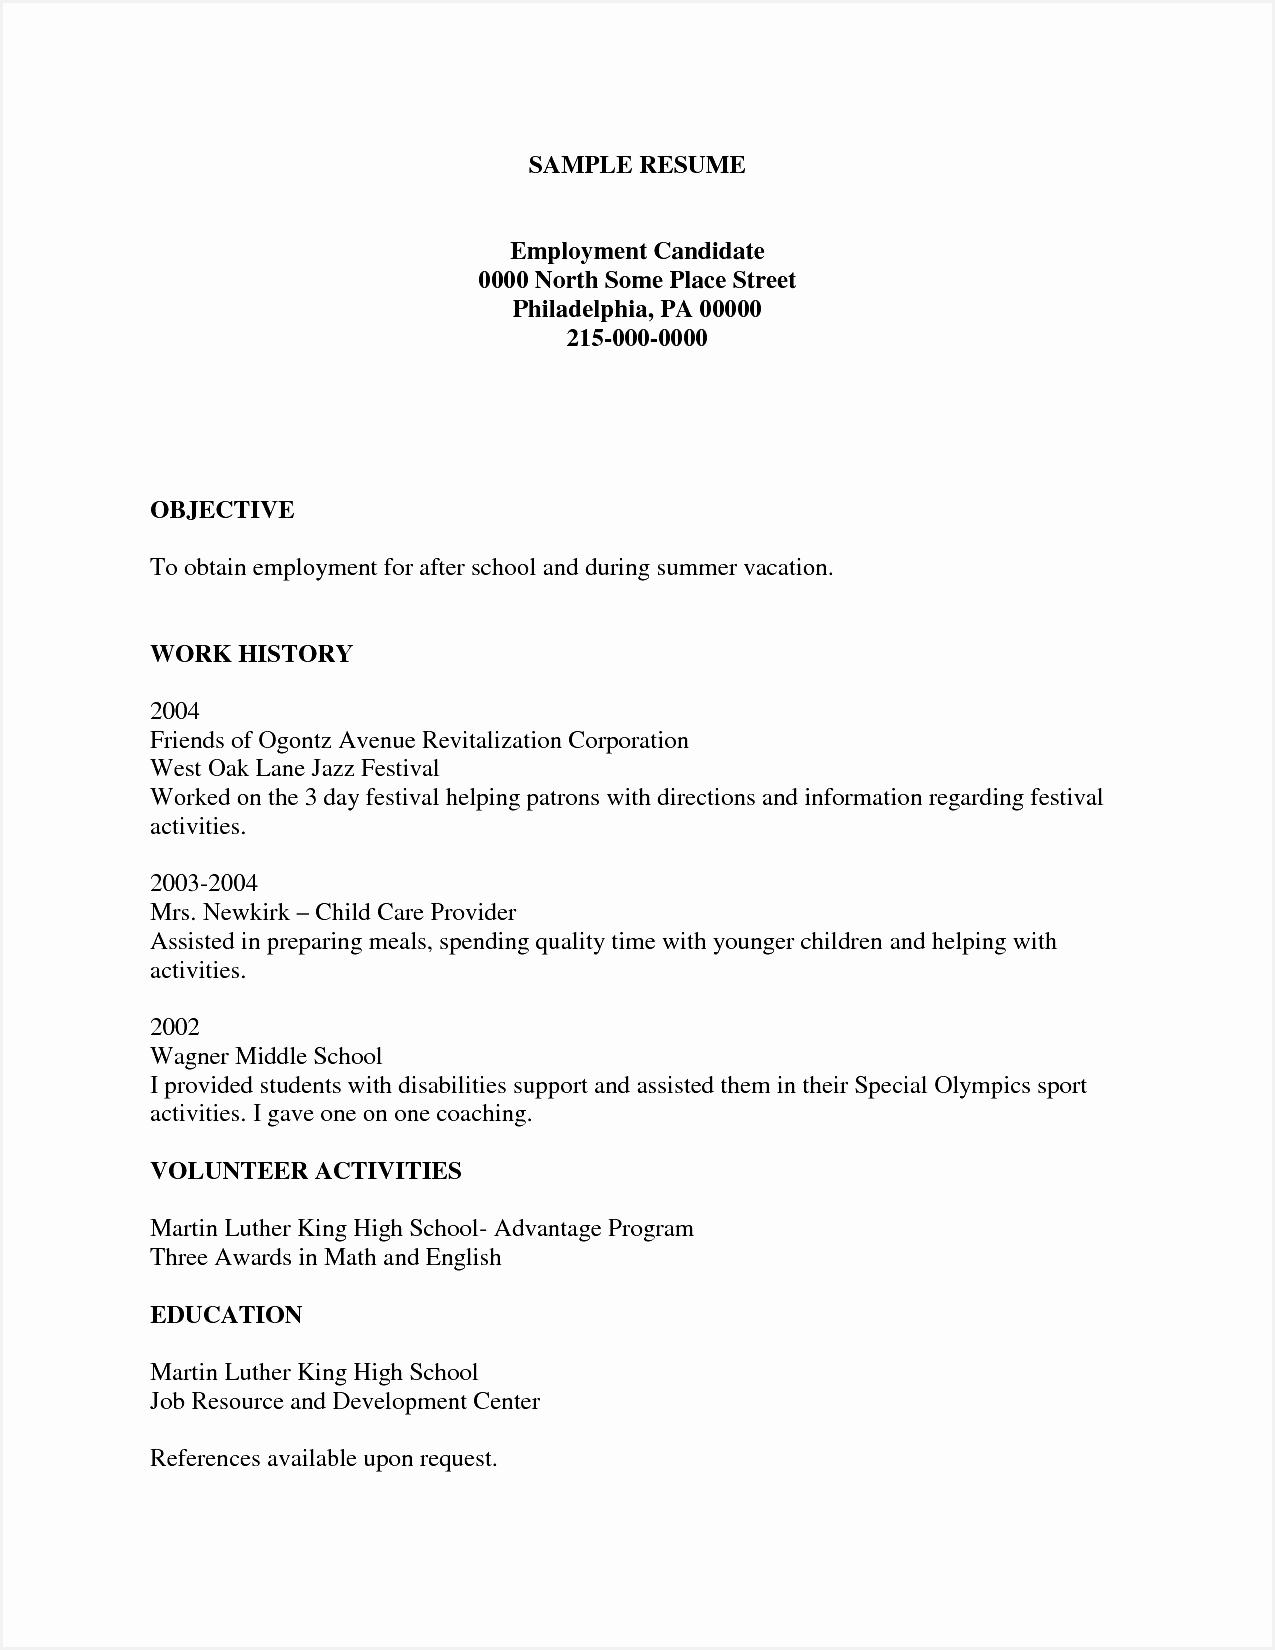 5 cv template australia download